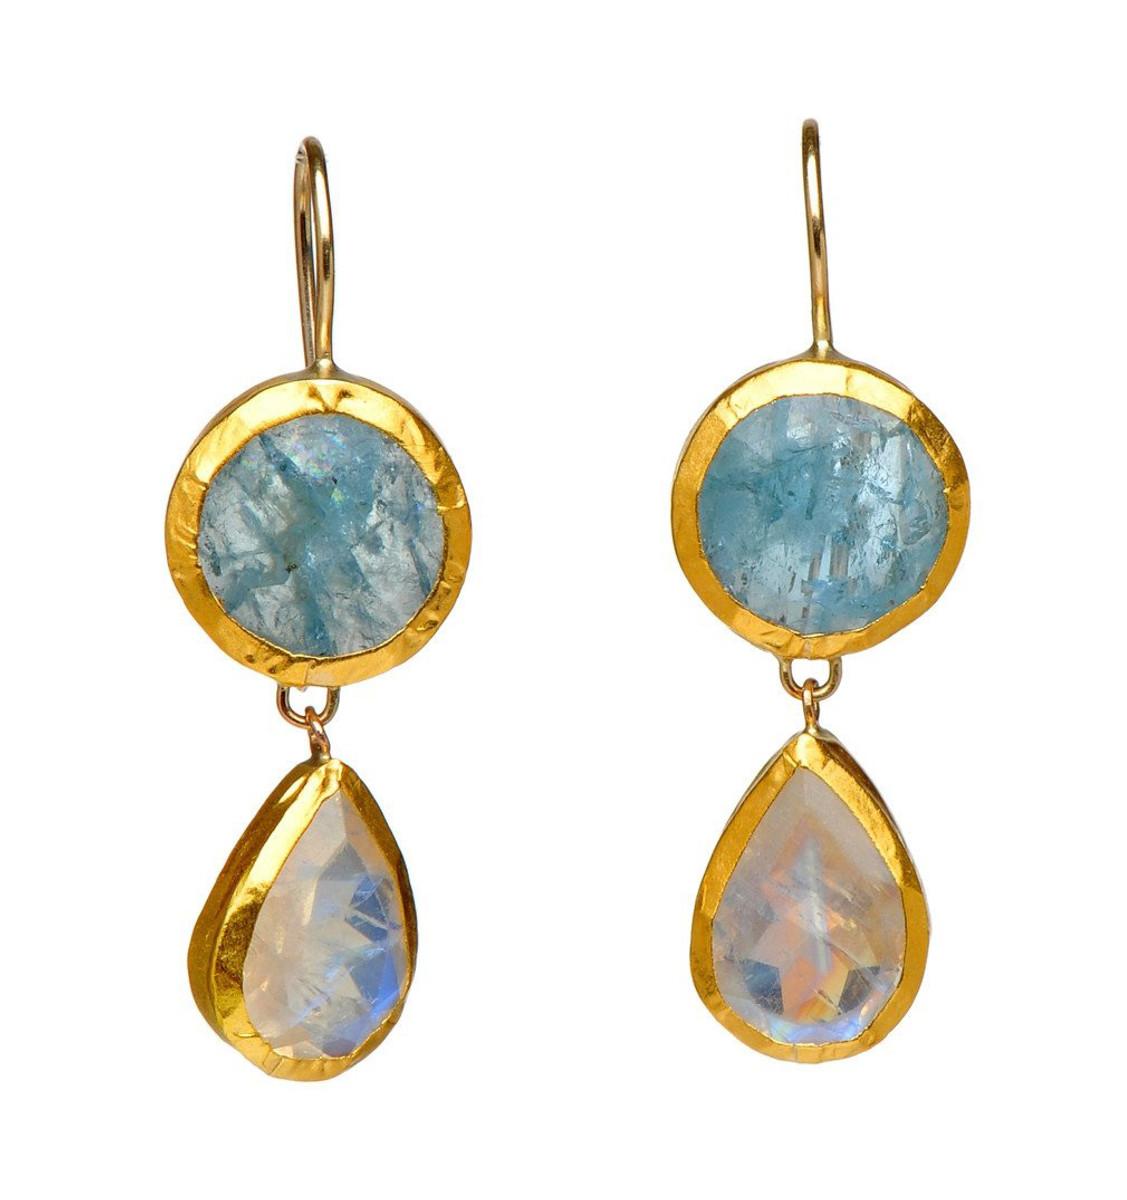 Peaceful Aquamarine and Moonstone Earrings - New Arrival